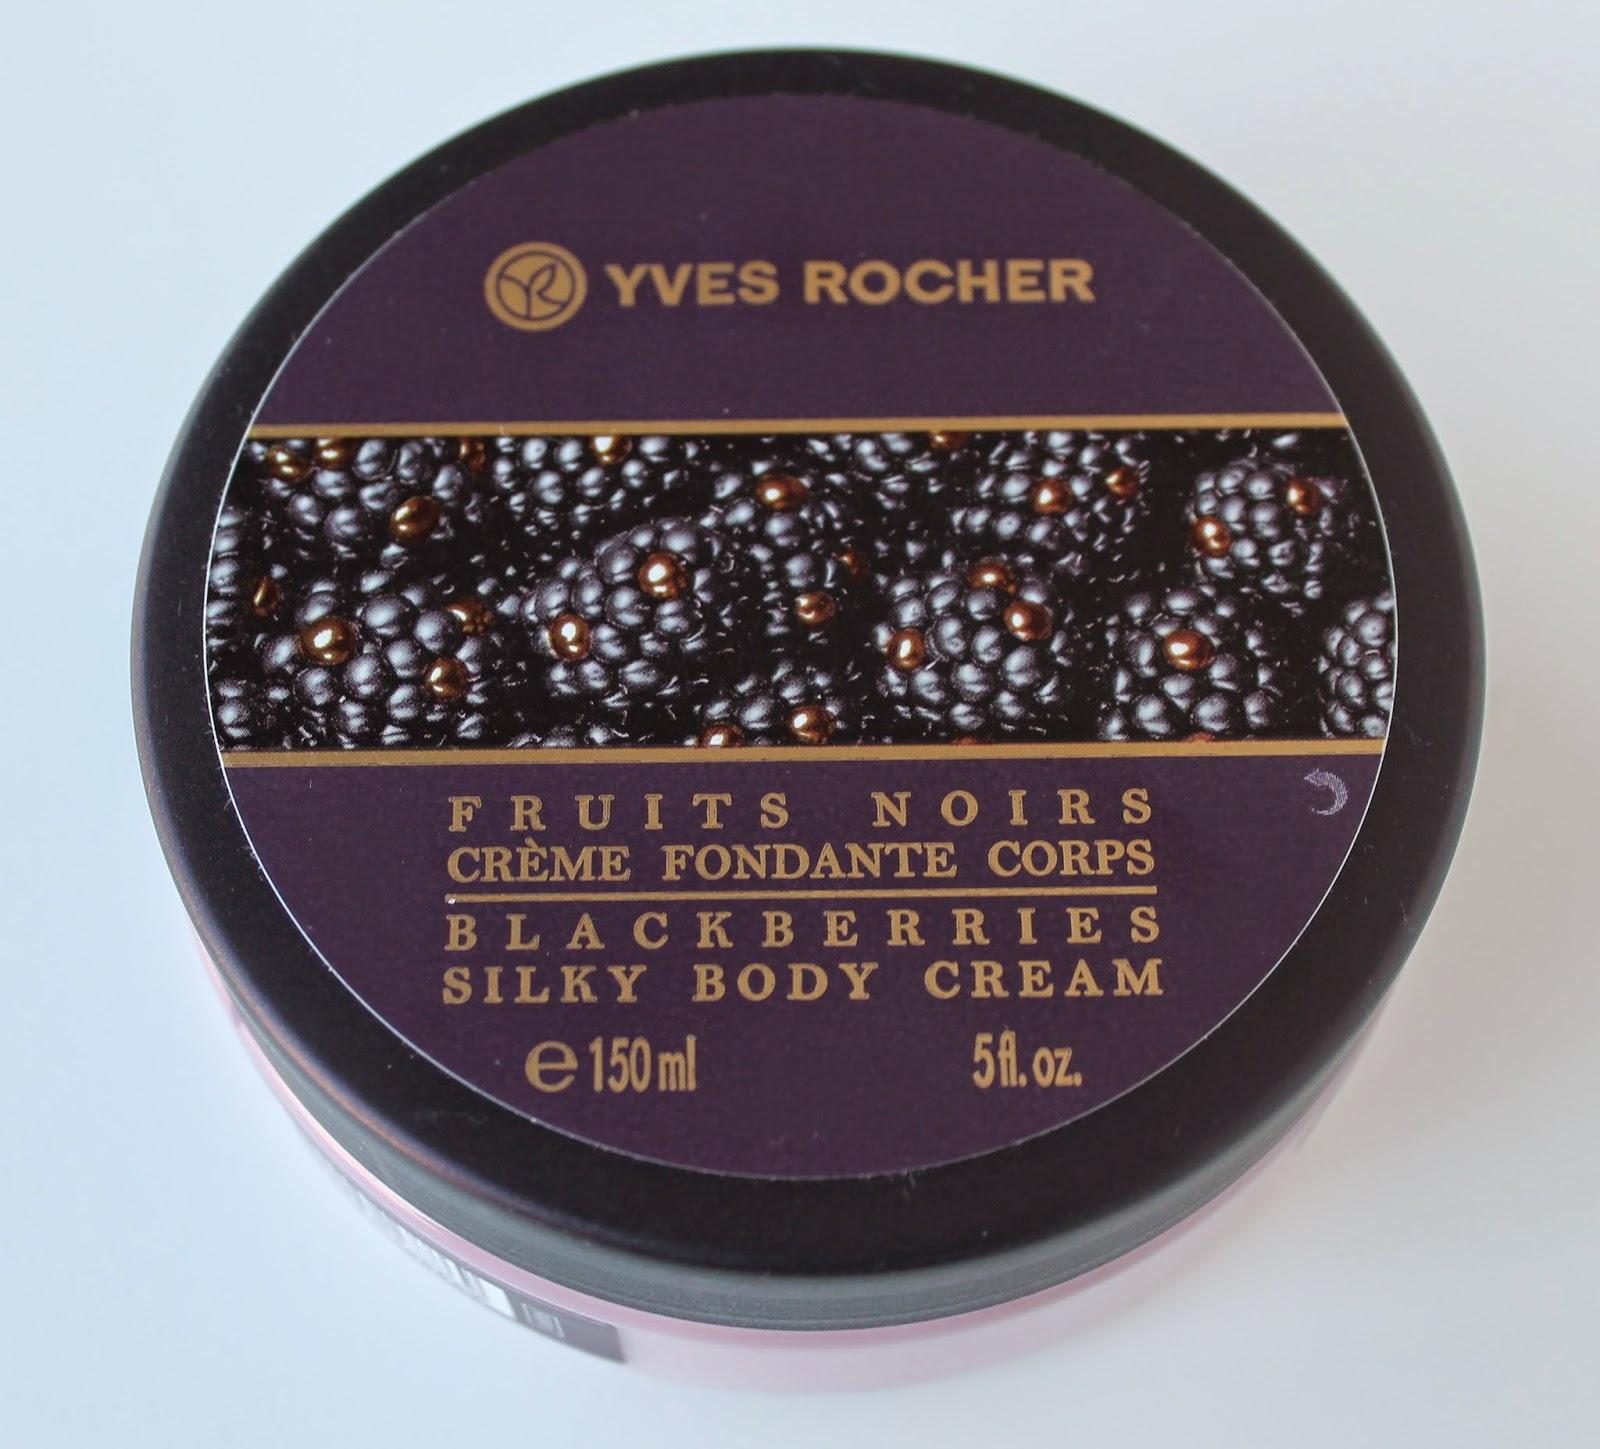 Yves Rocher crème fondante corps